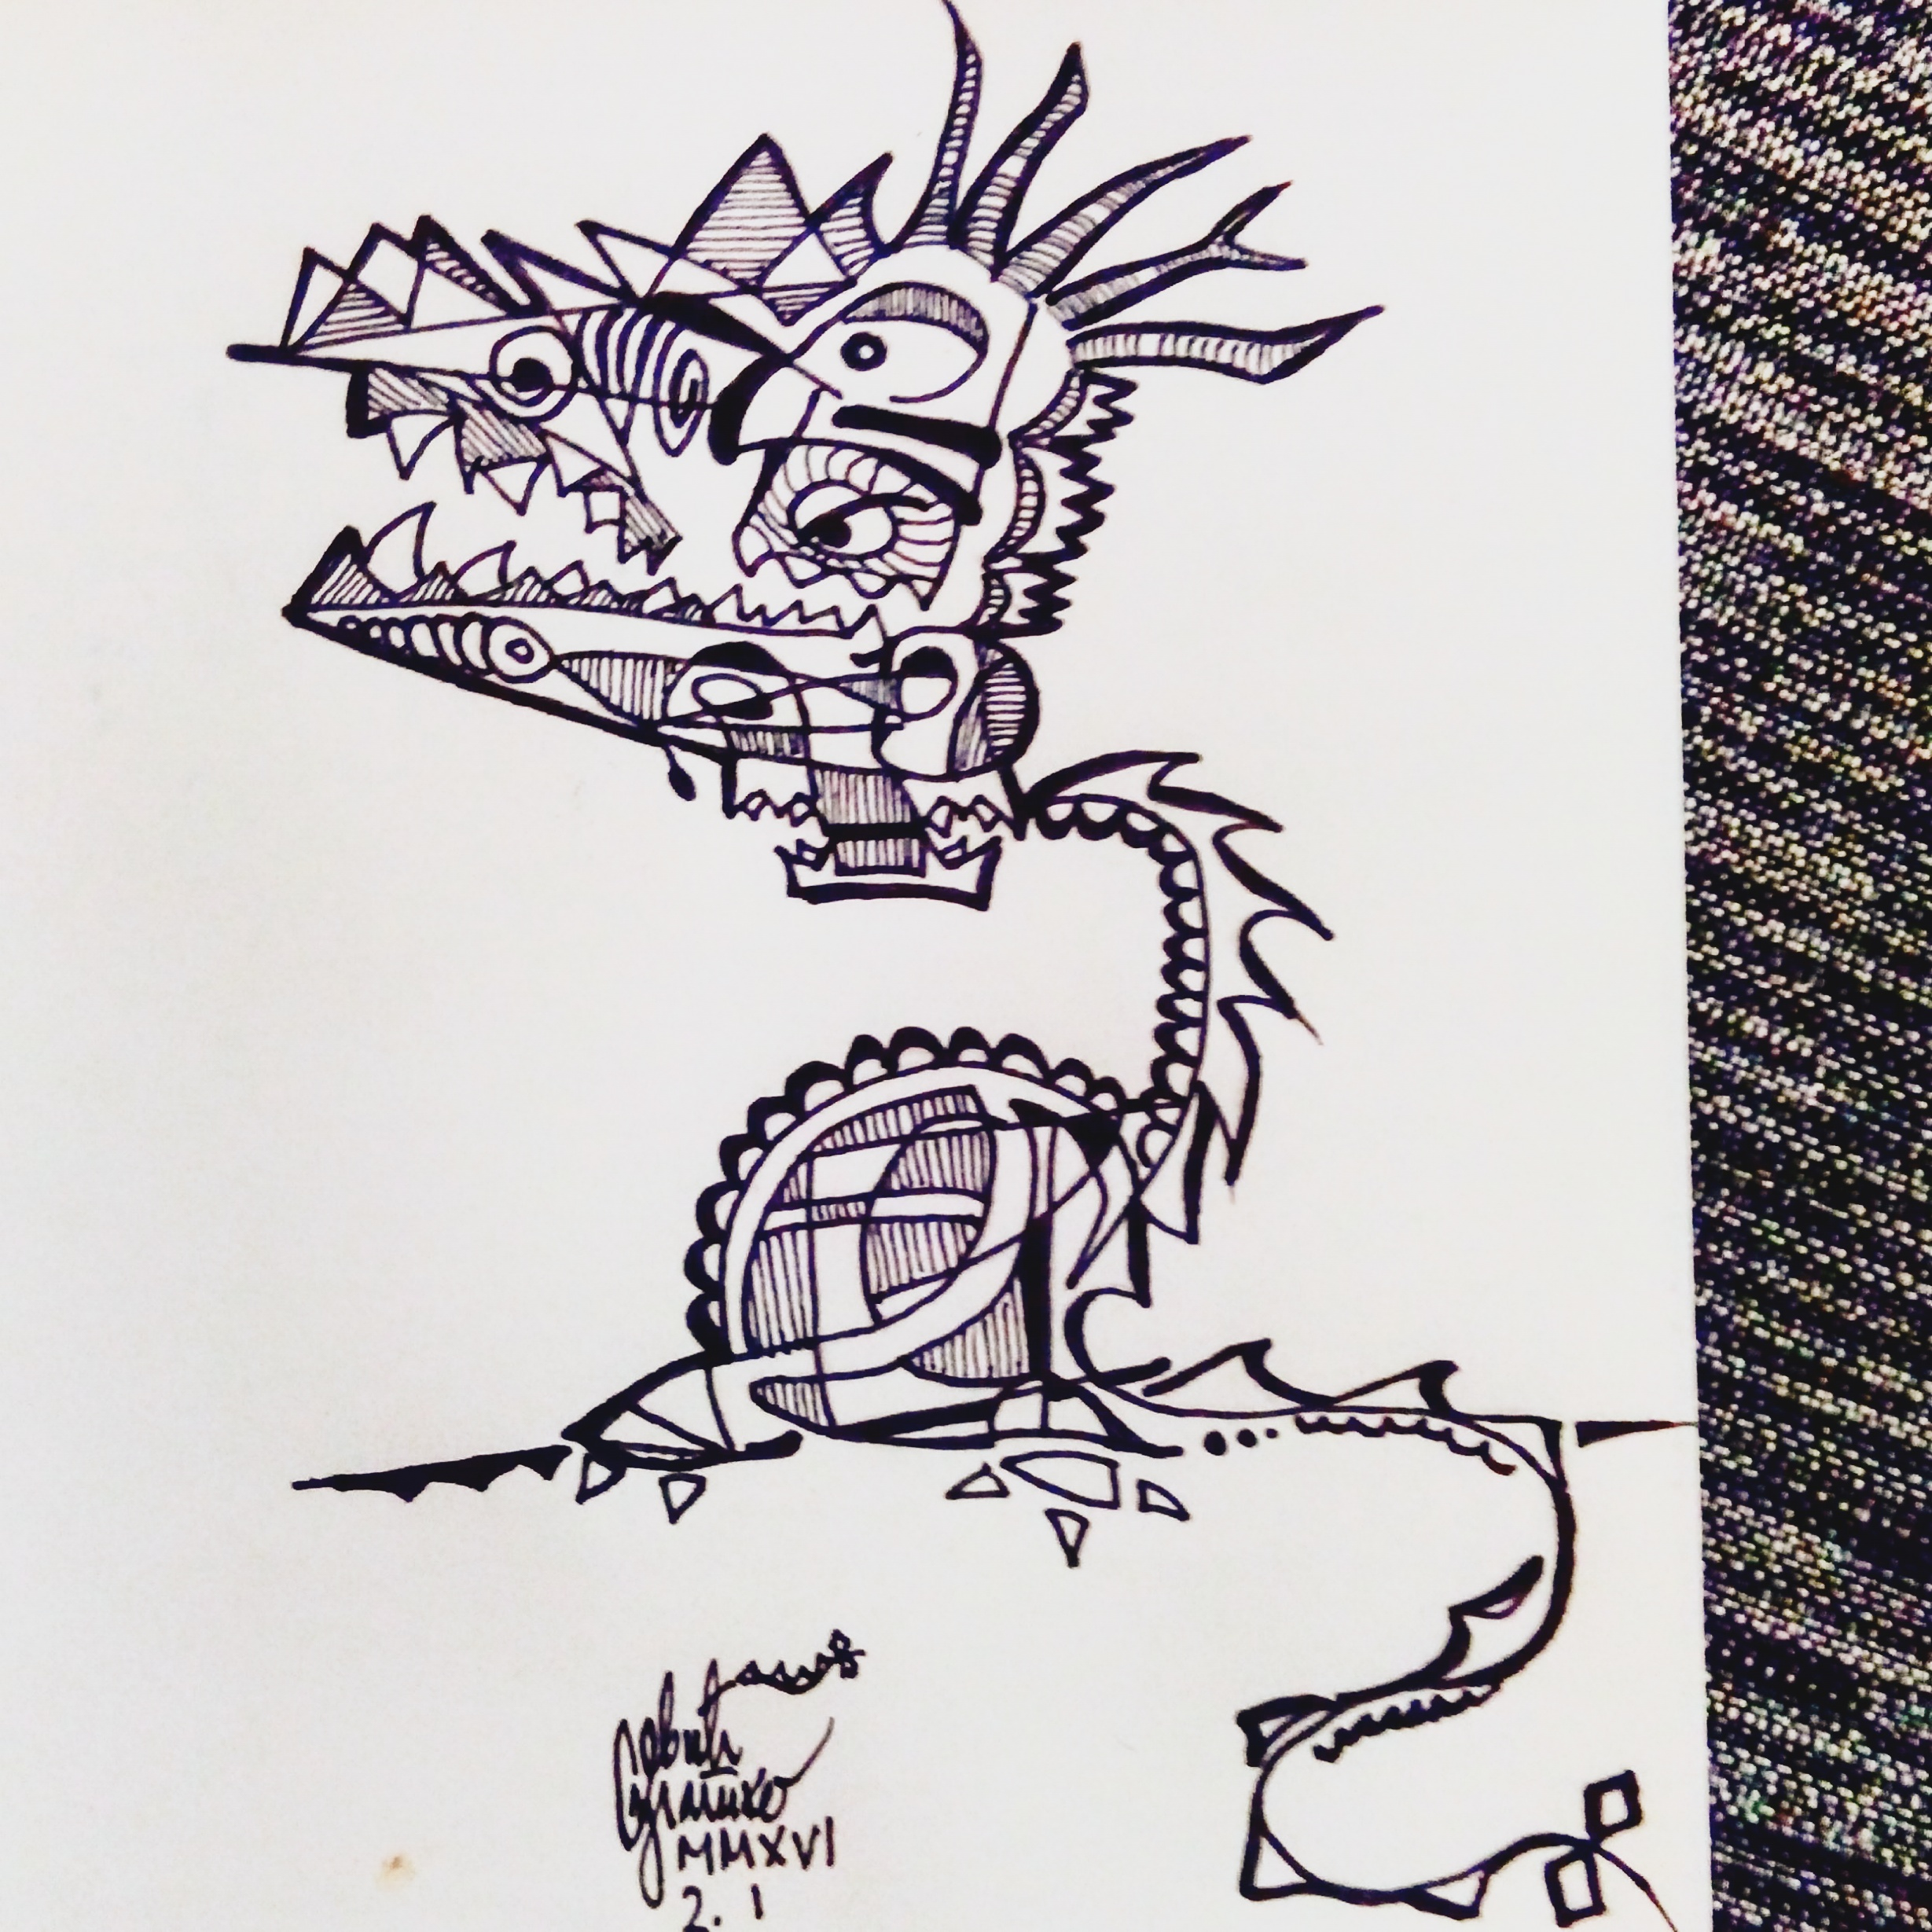 Morning doodle - 2. I '16. - Four headed dragon by zlajonja